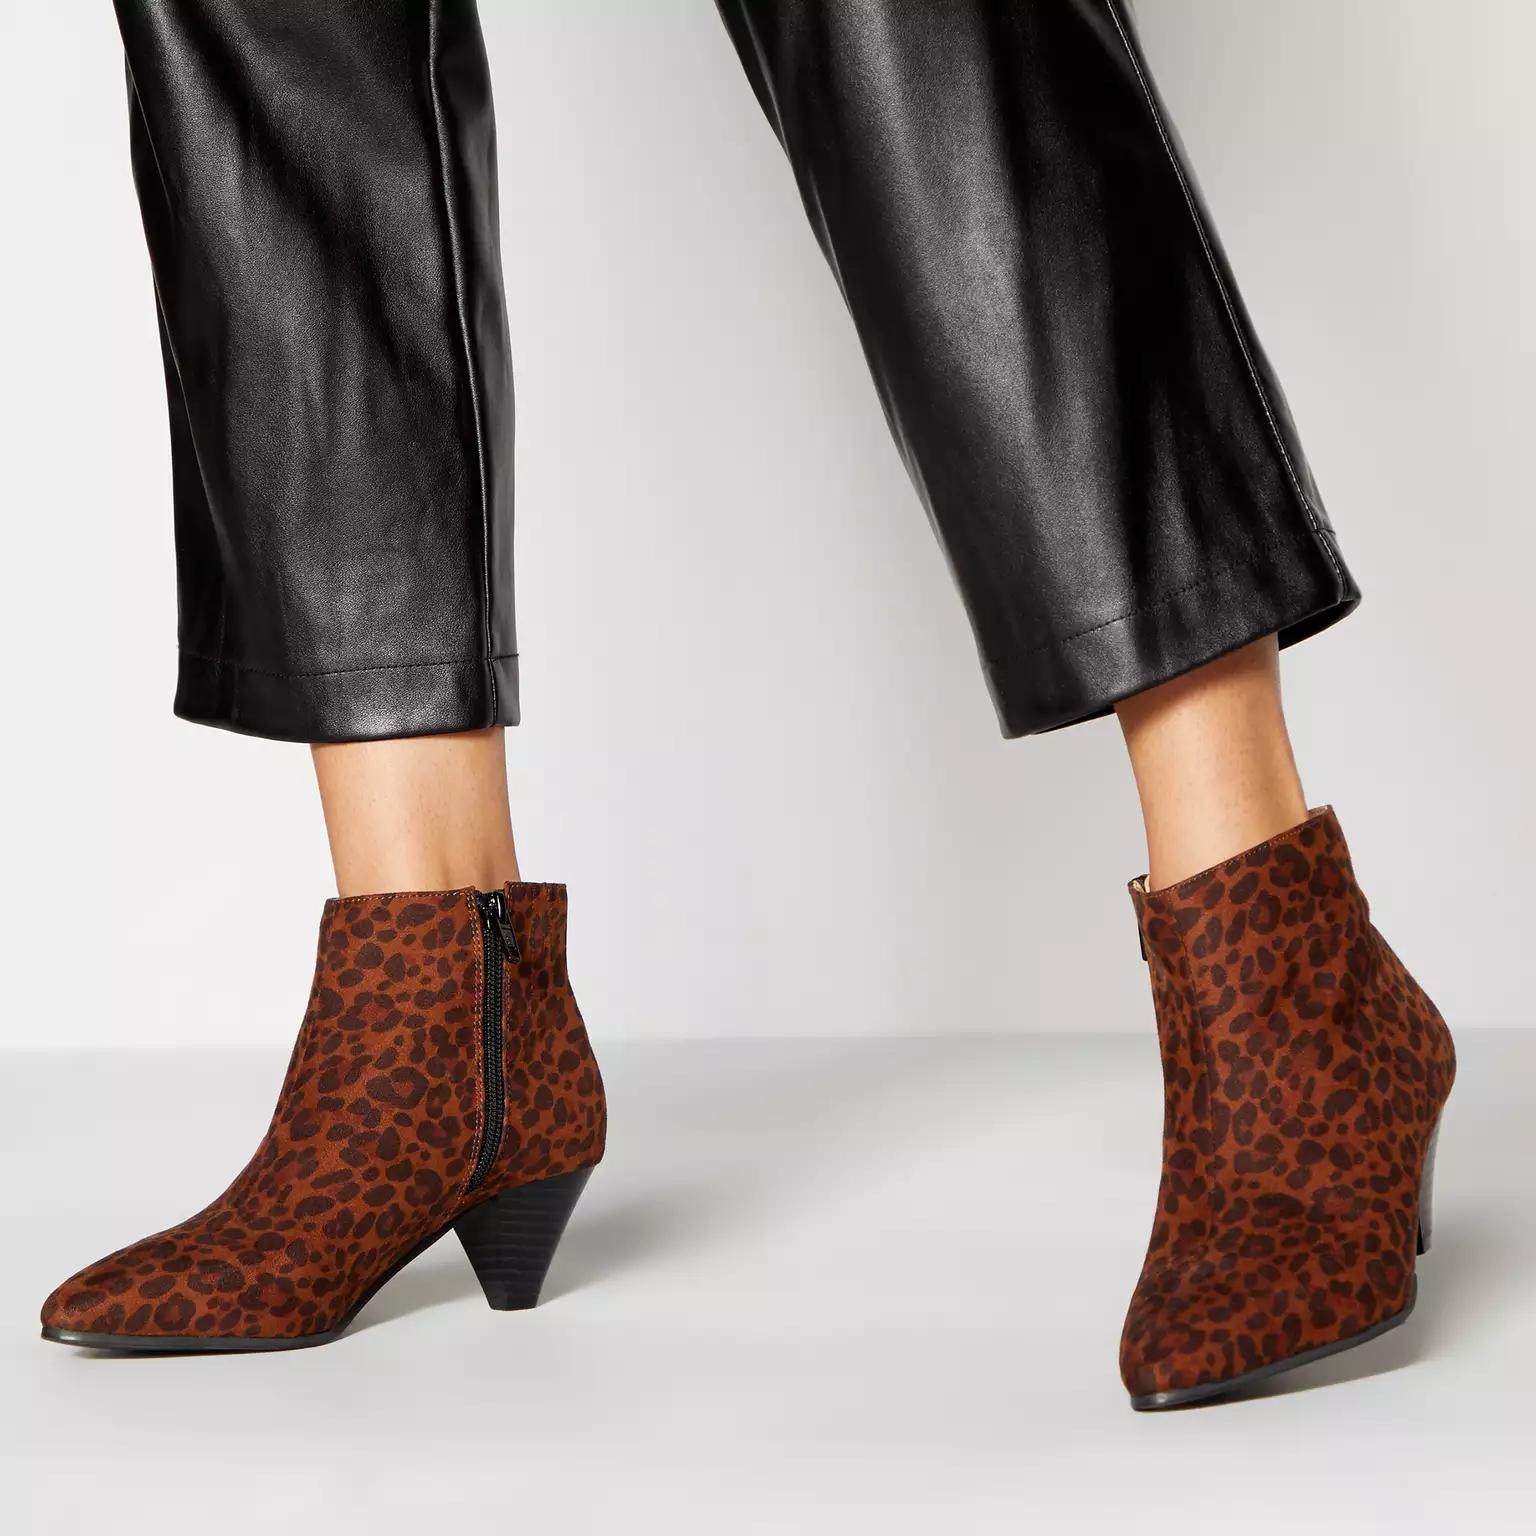 Principles Leopard Print Faux Suede Peg Heel Ankle Boots £10.50 + Free click & collect @ Debenhams